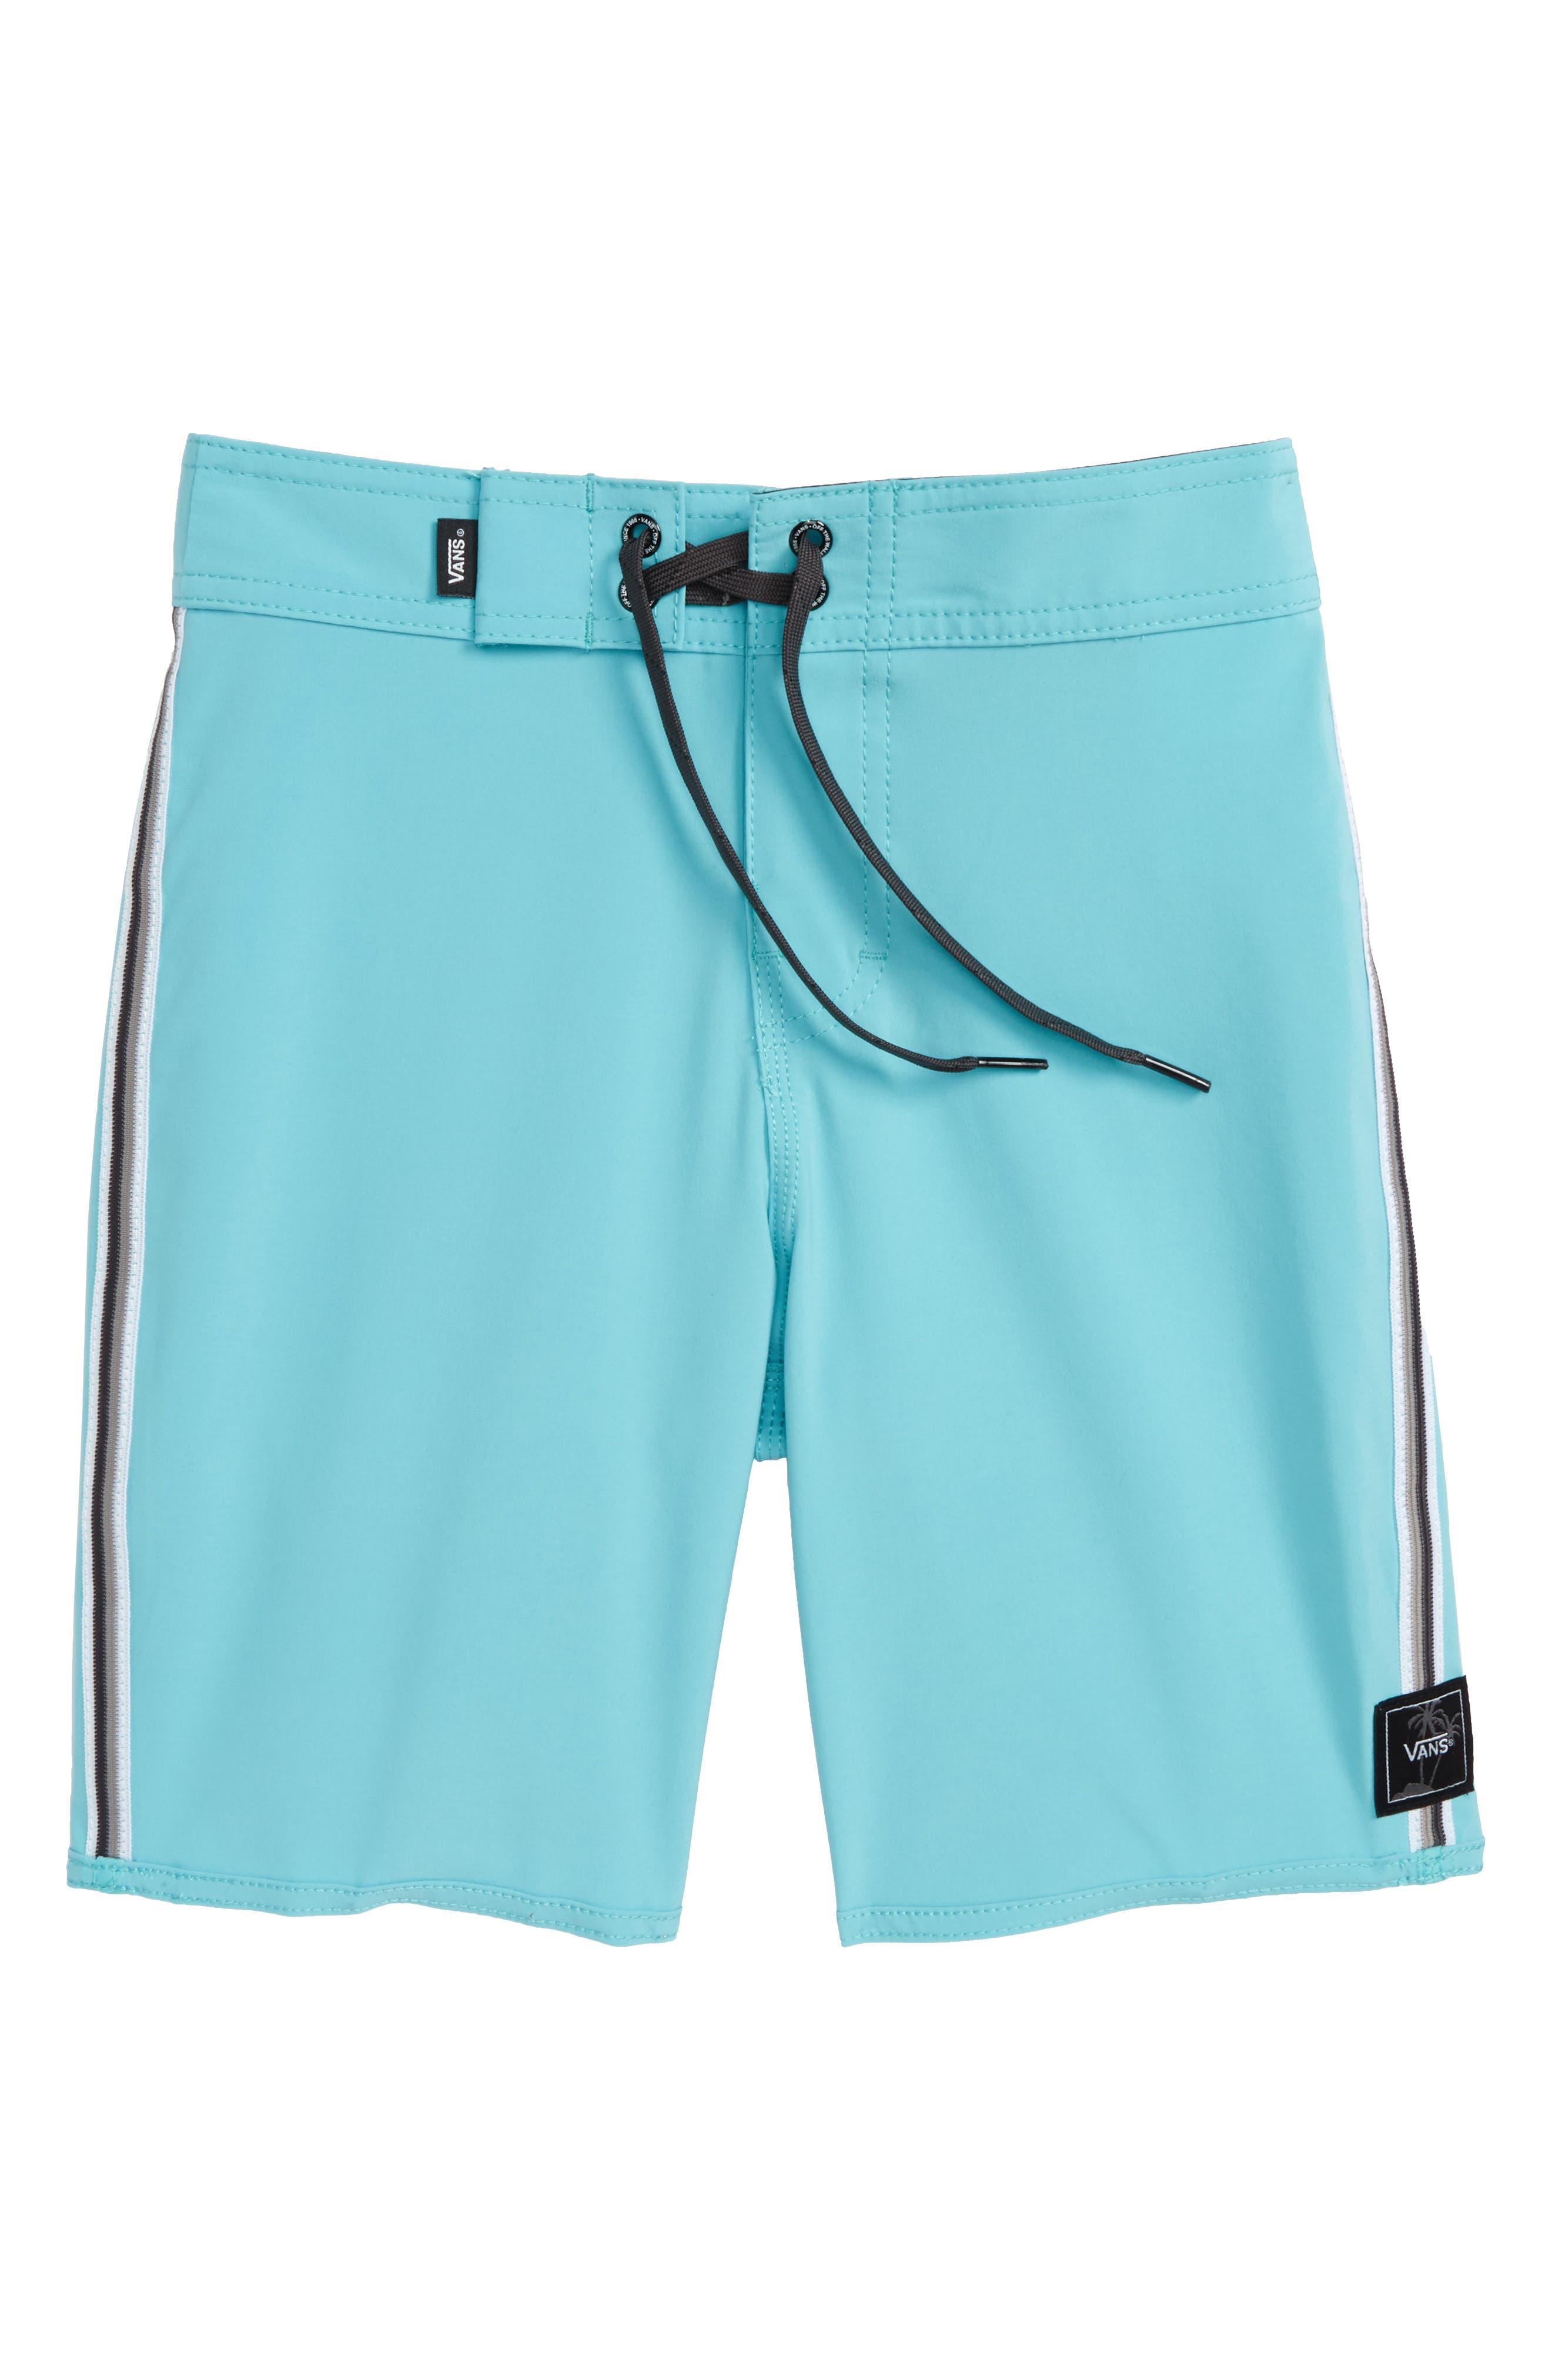 Sidestripe Board Shorts,                         Main,                         color, Aquarelle